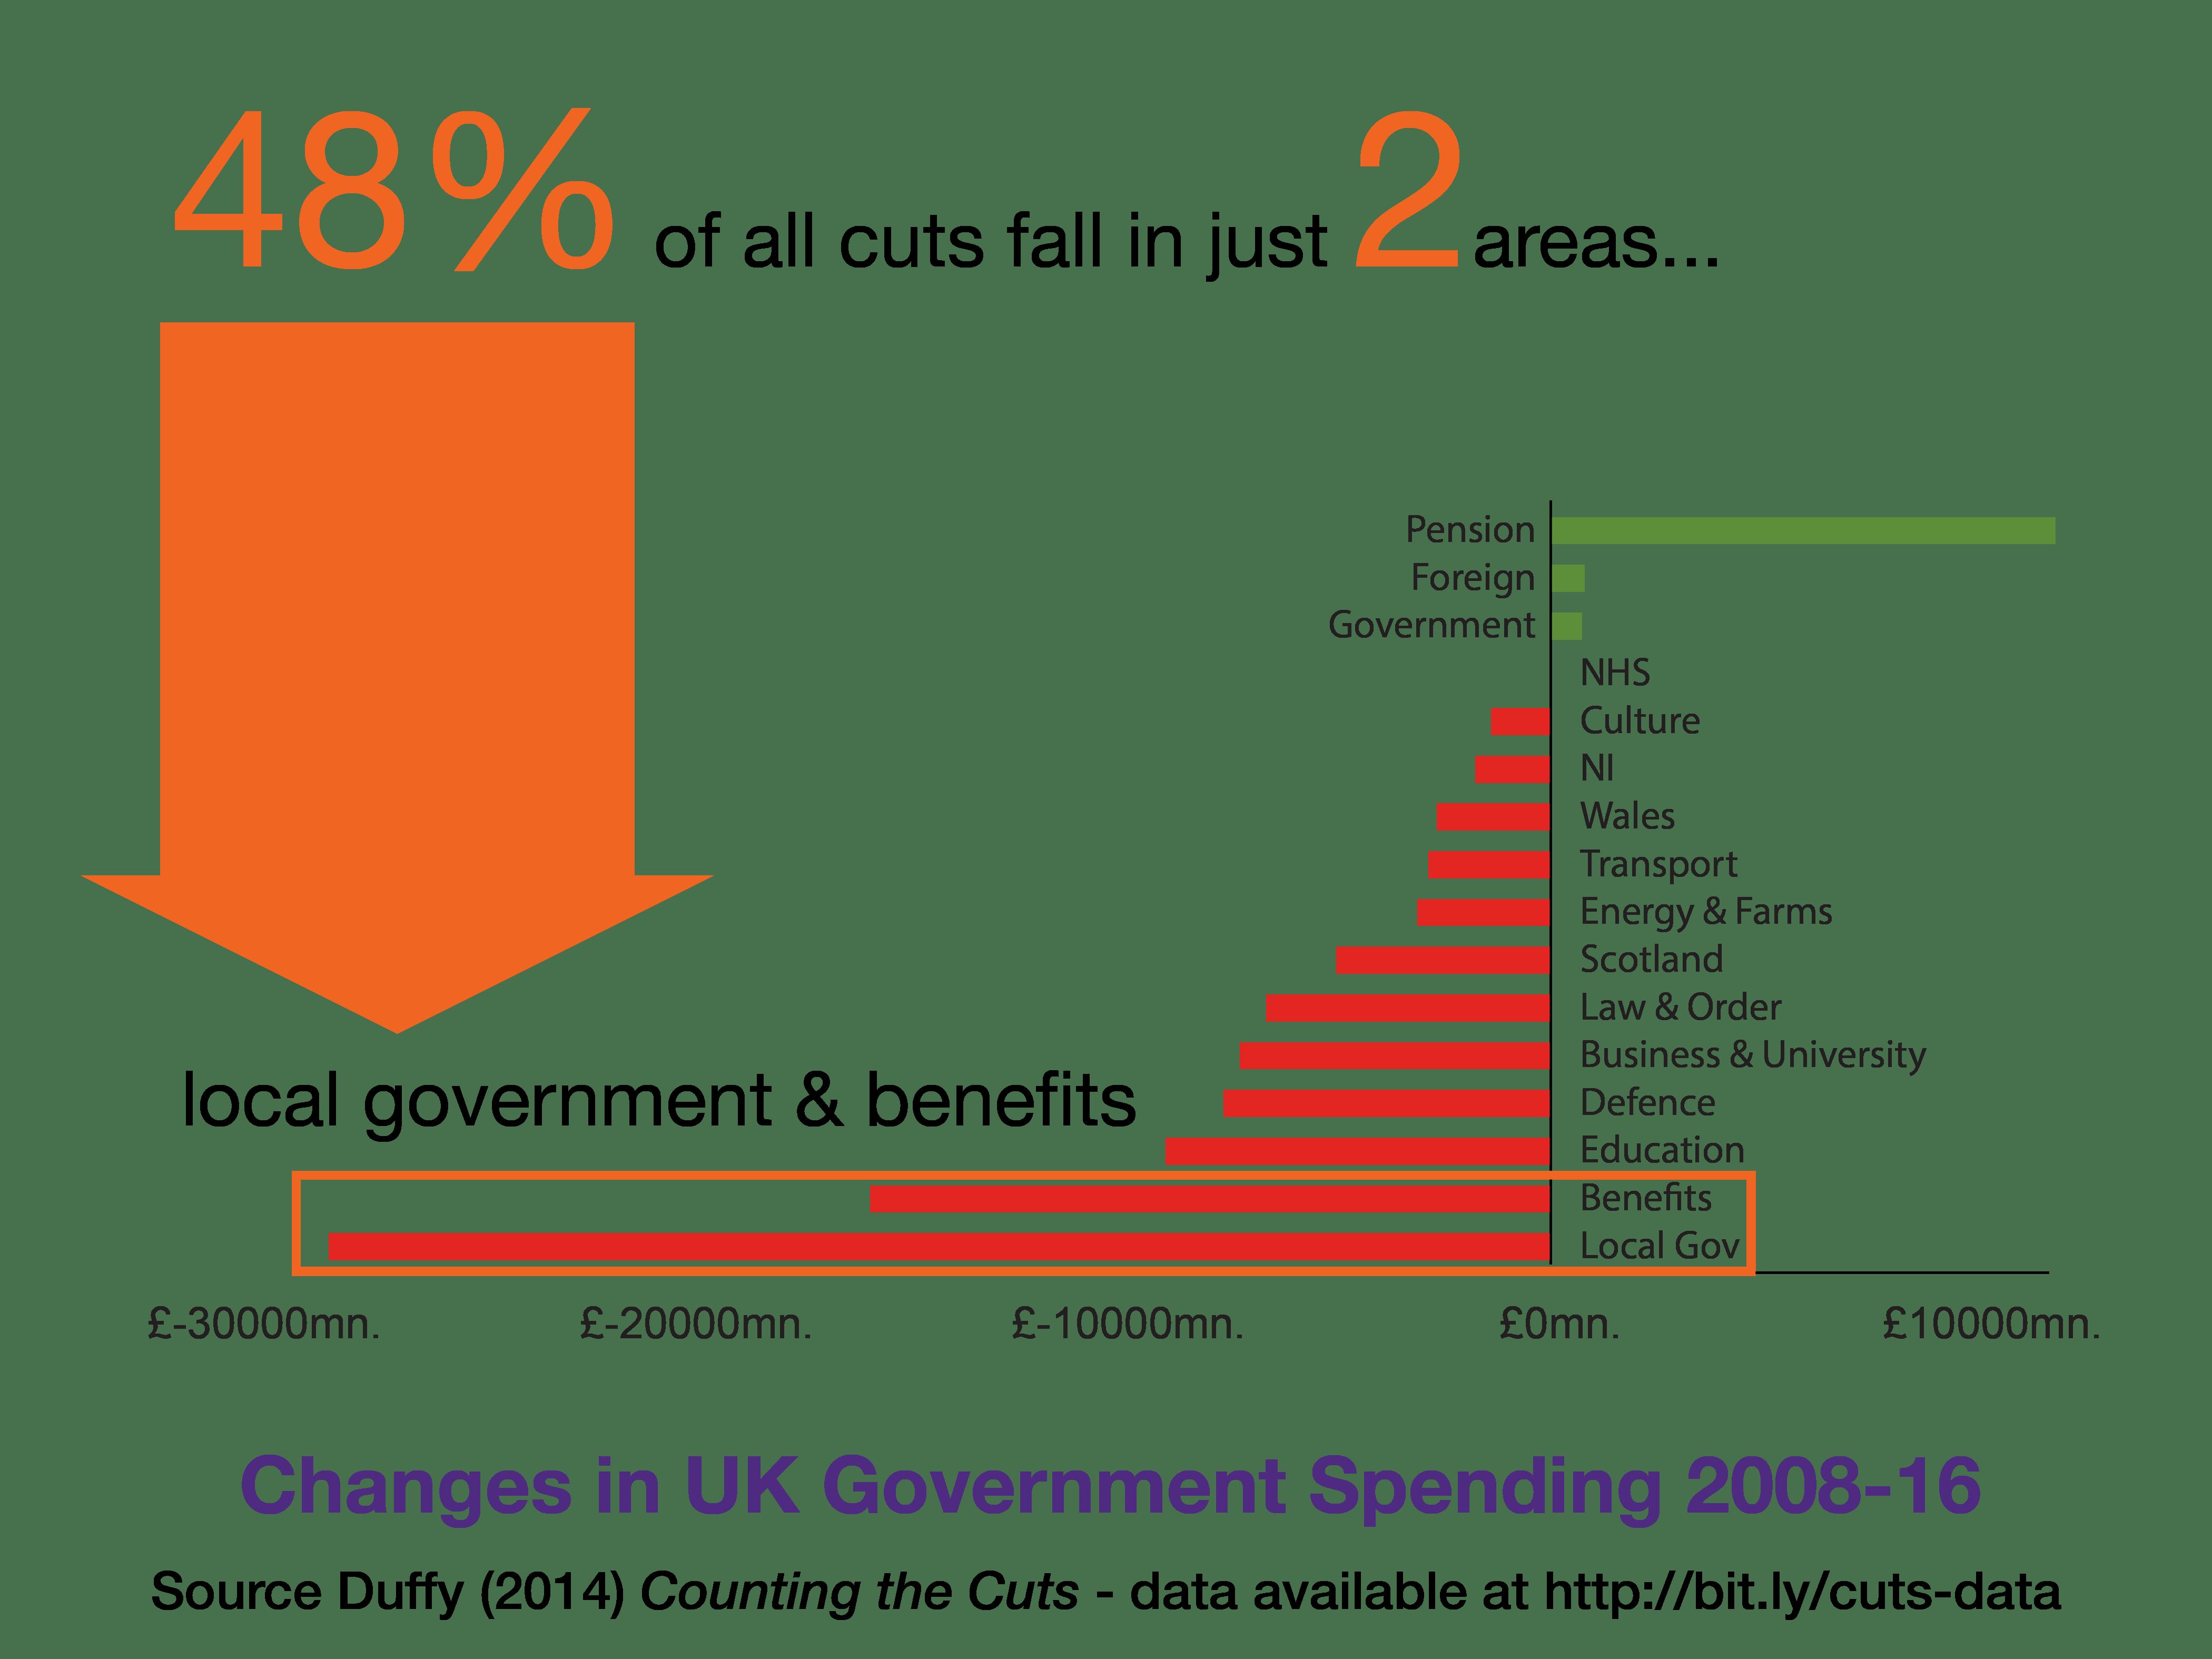 Real Changes UK Public Spending (2008-15